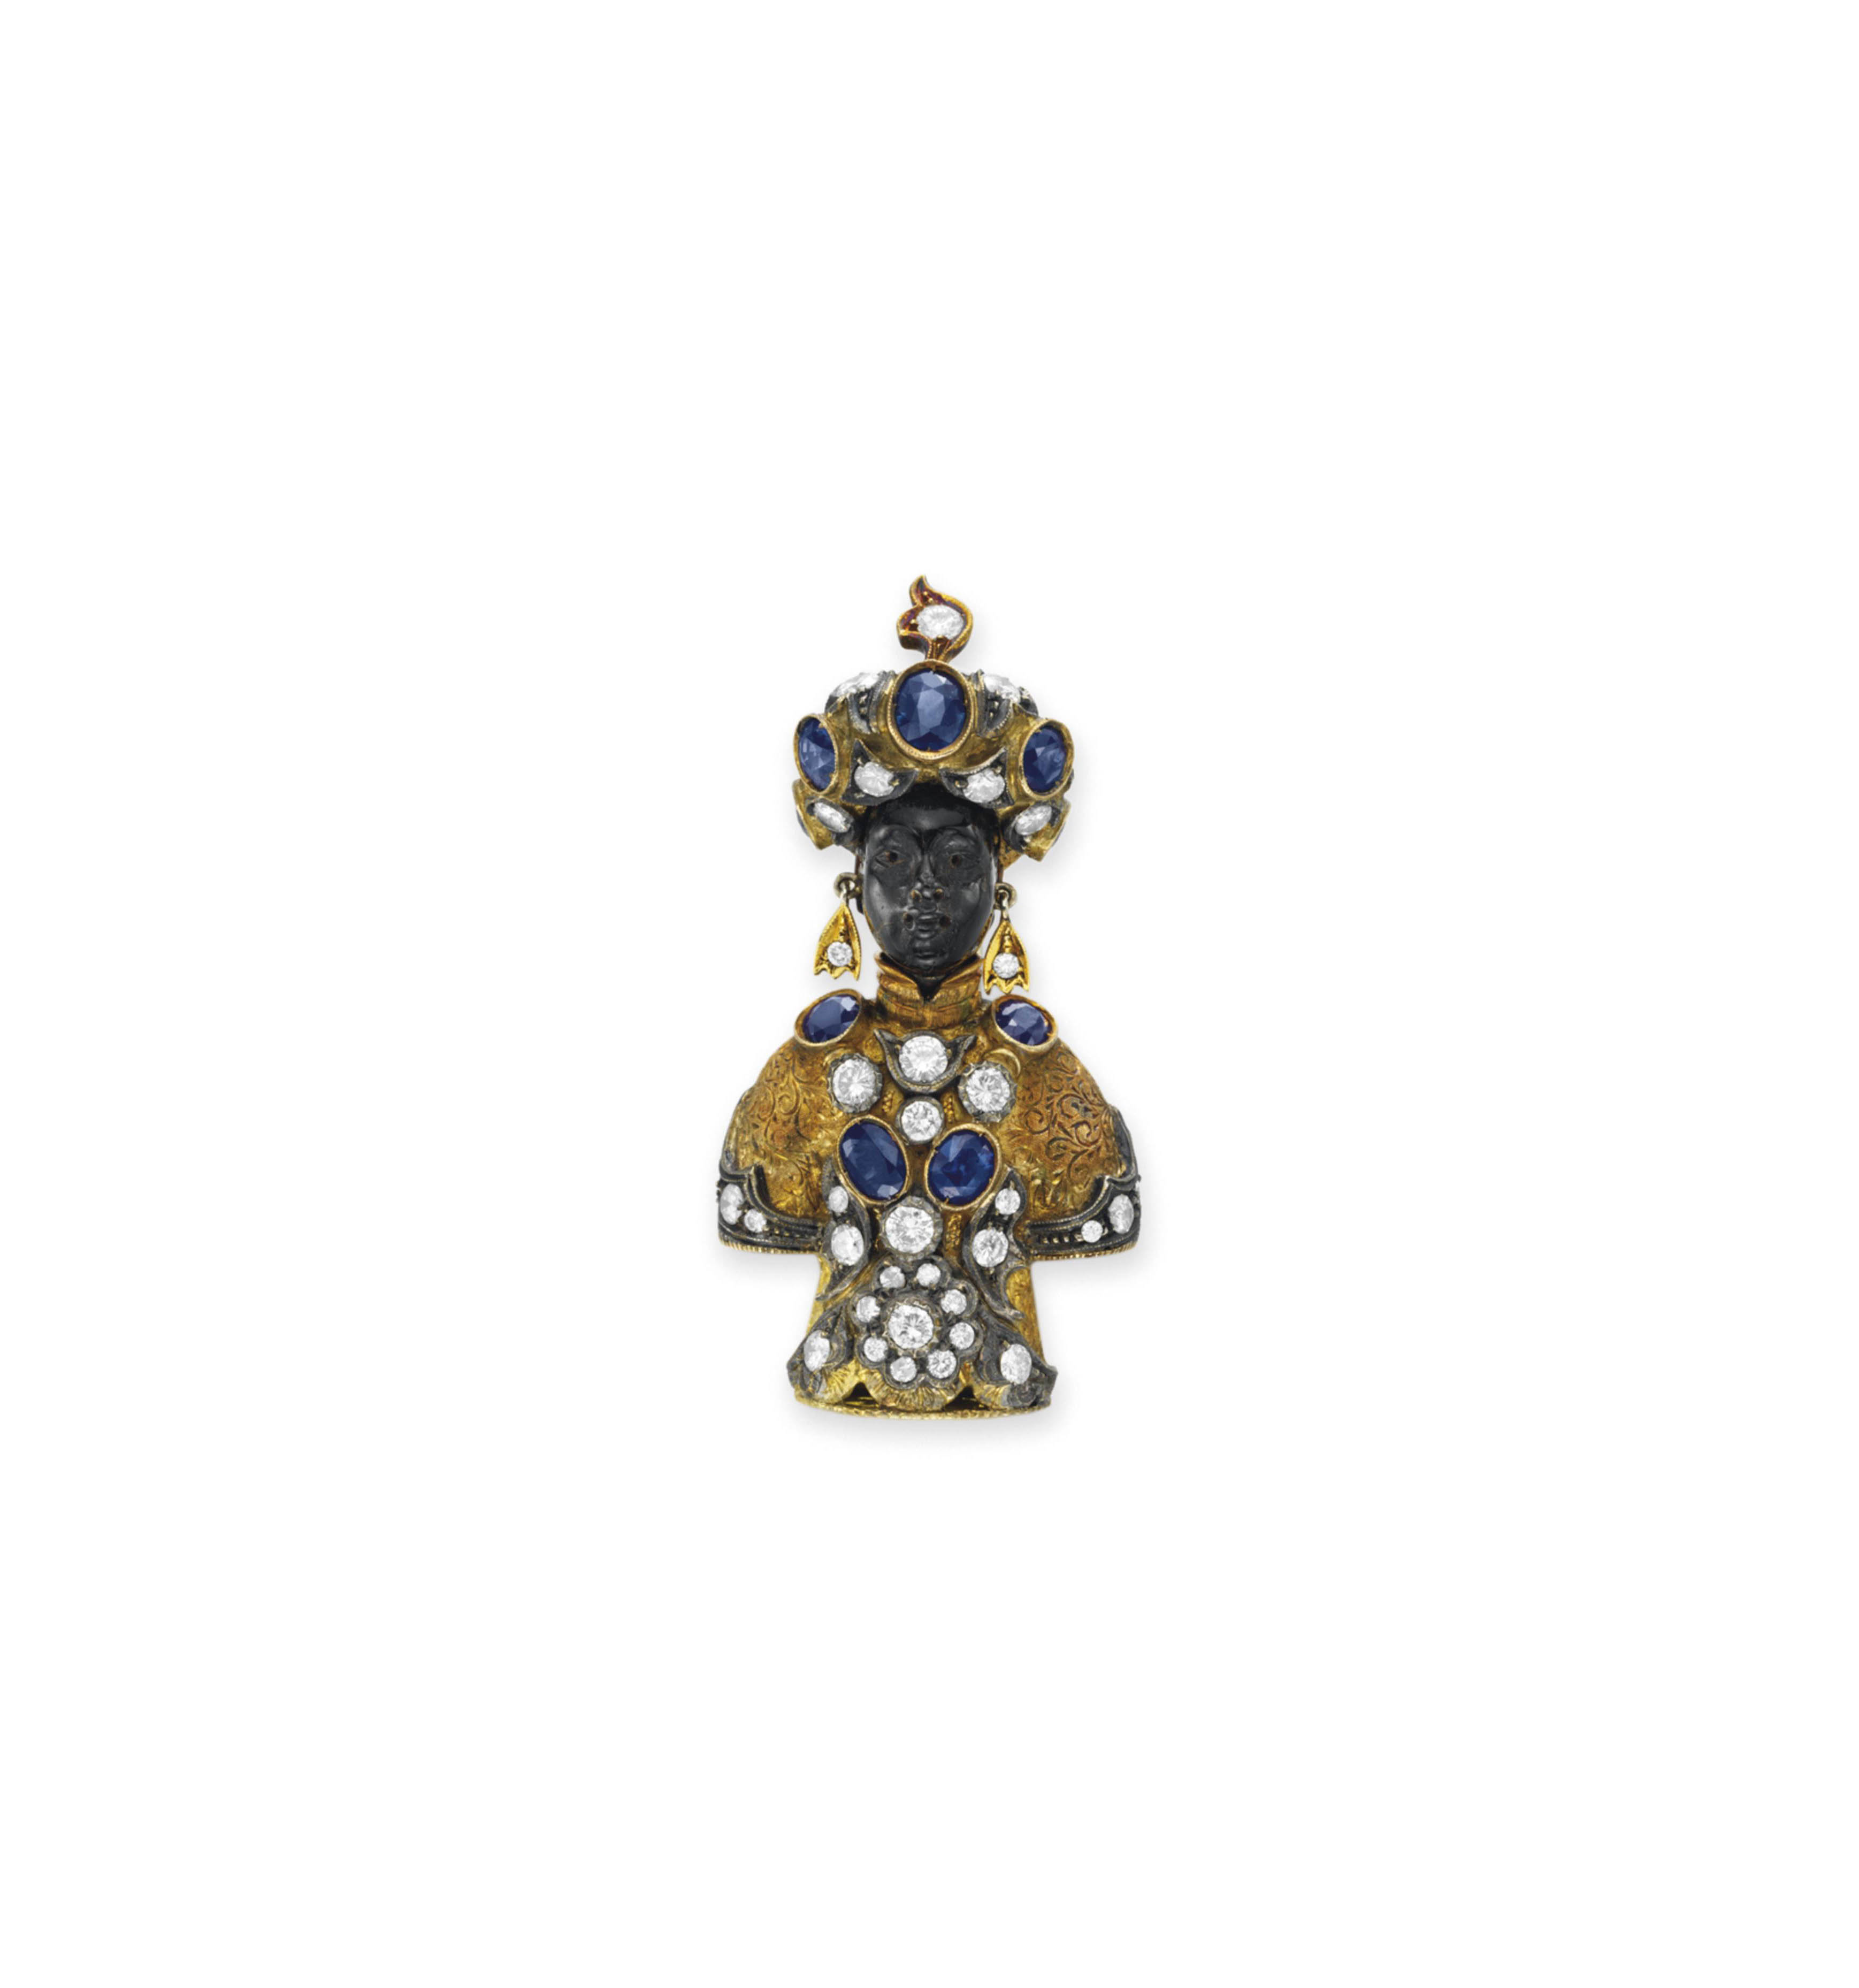 A DIAMOND, SAPPHIRE AND GOLD BLACKAMOOR BROOCH, BY NARDI